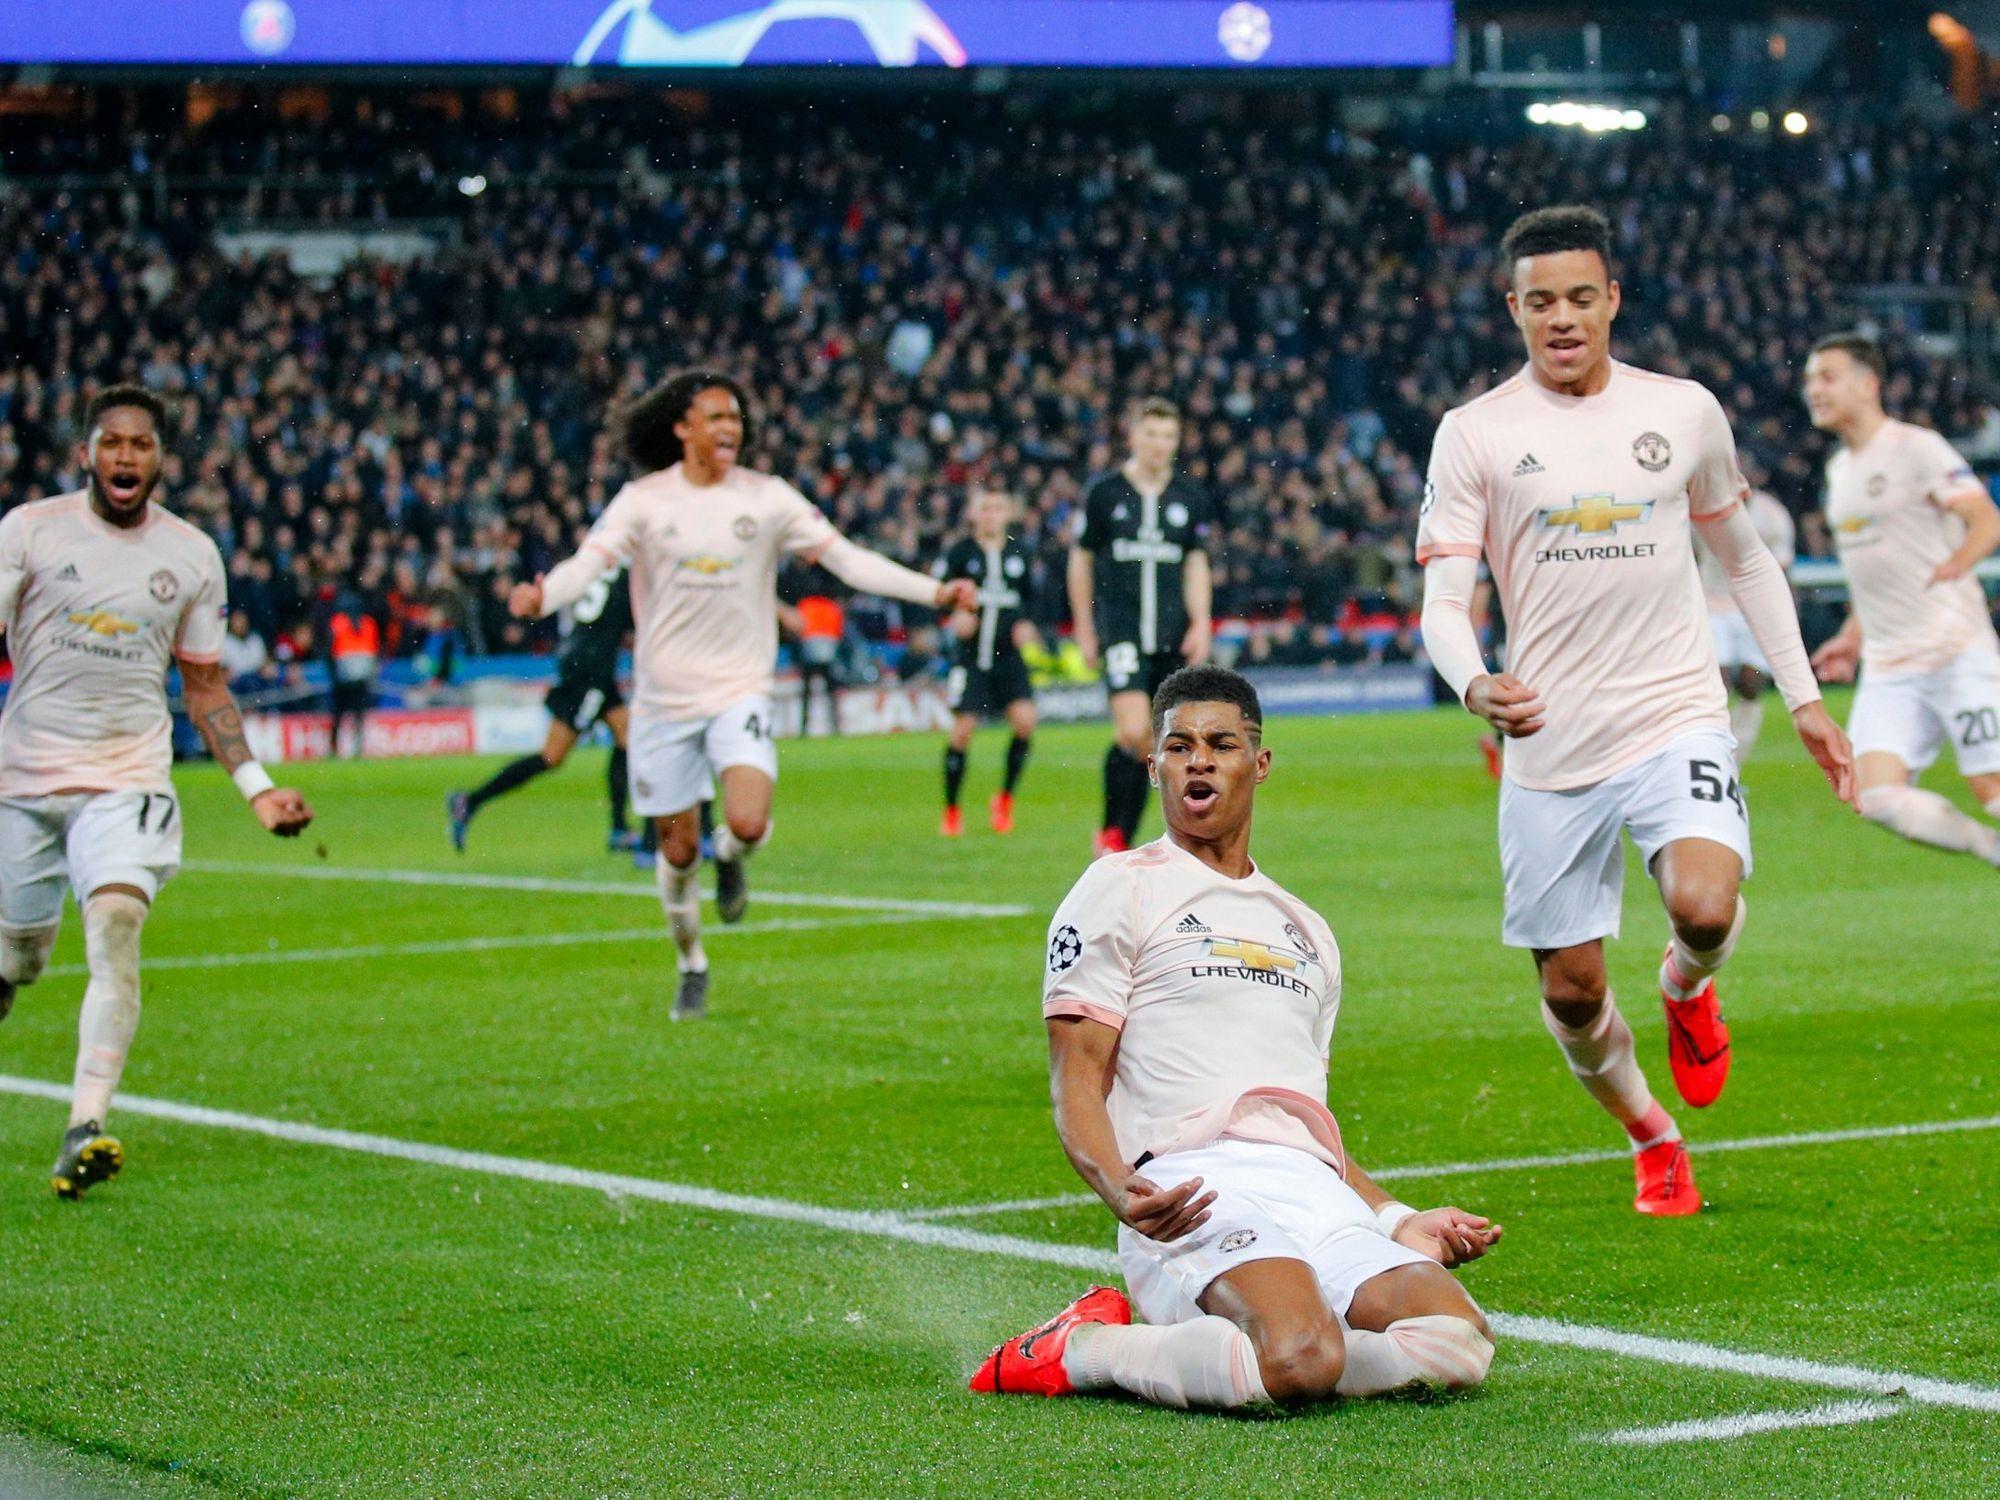 The Joy of an Unlikely Win